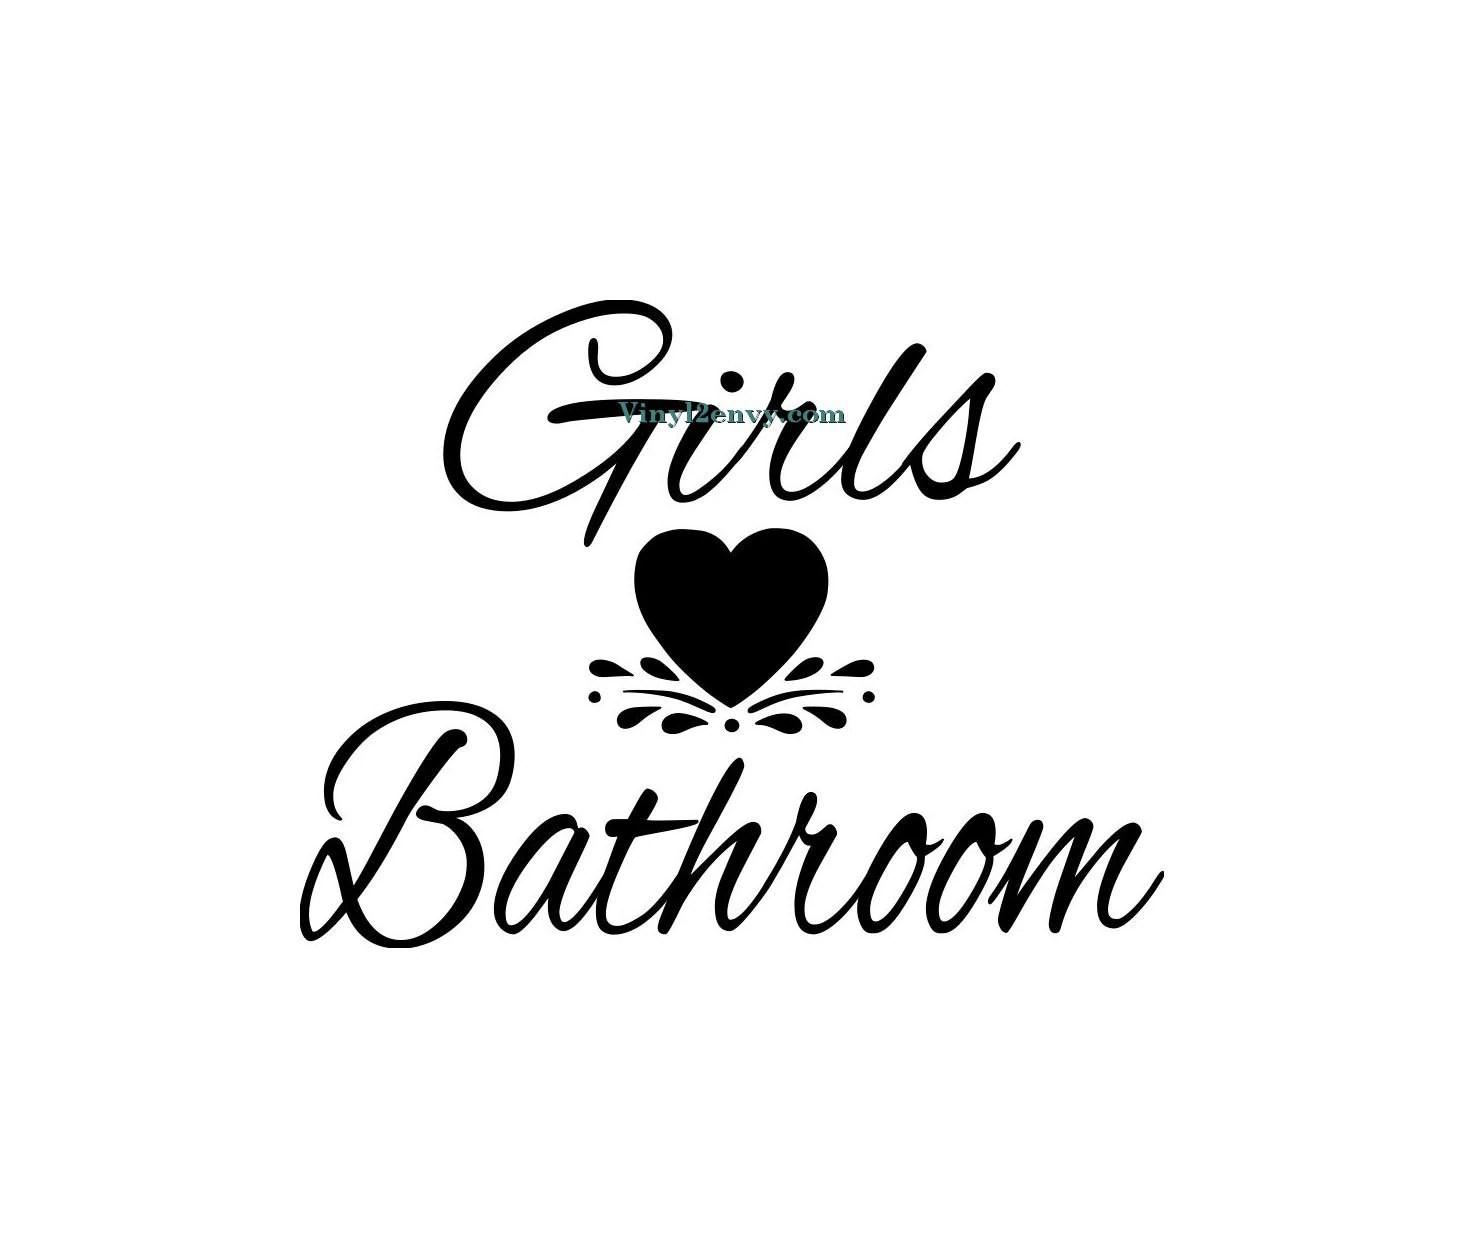 Girls Bathroom Wall Decal Vinyl Wall Decals Wall Decor